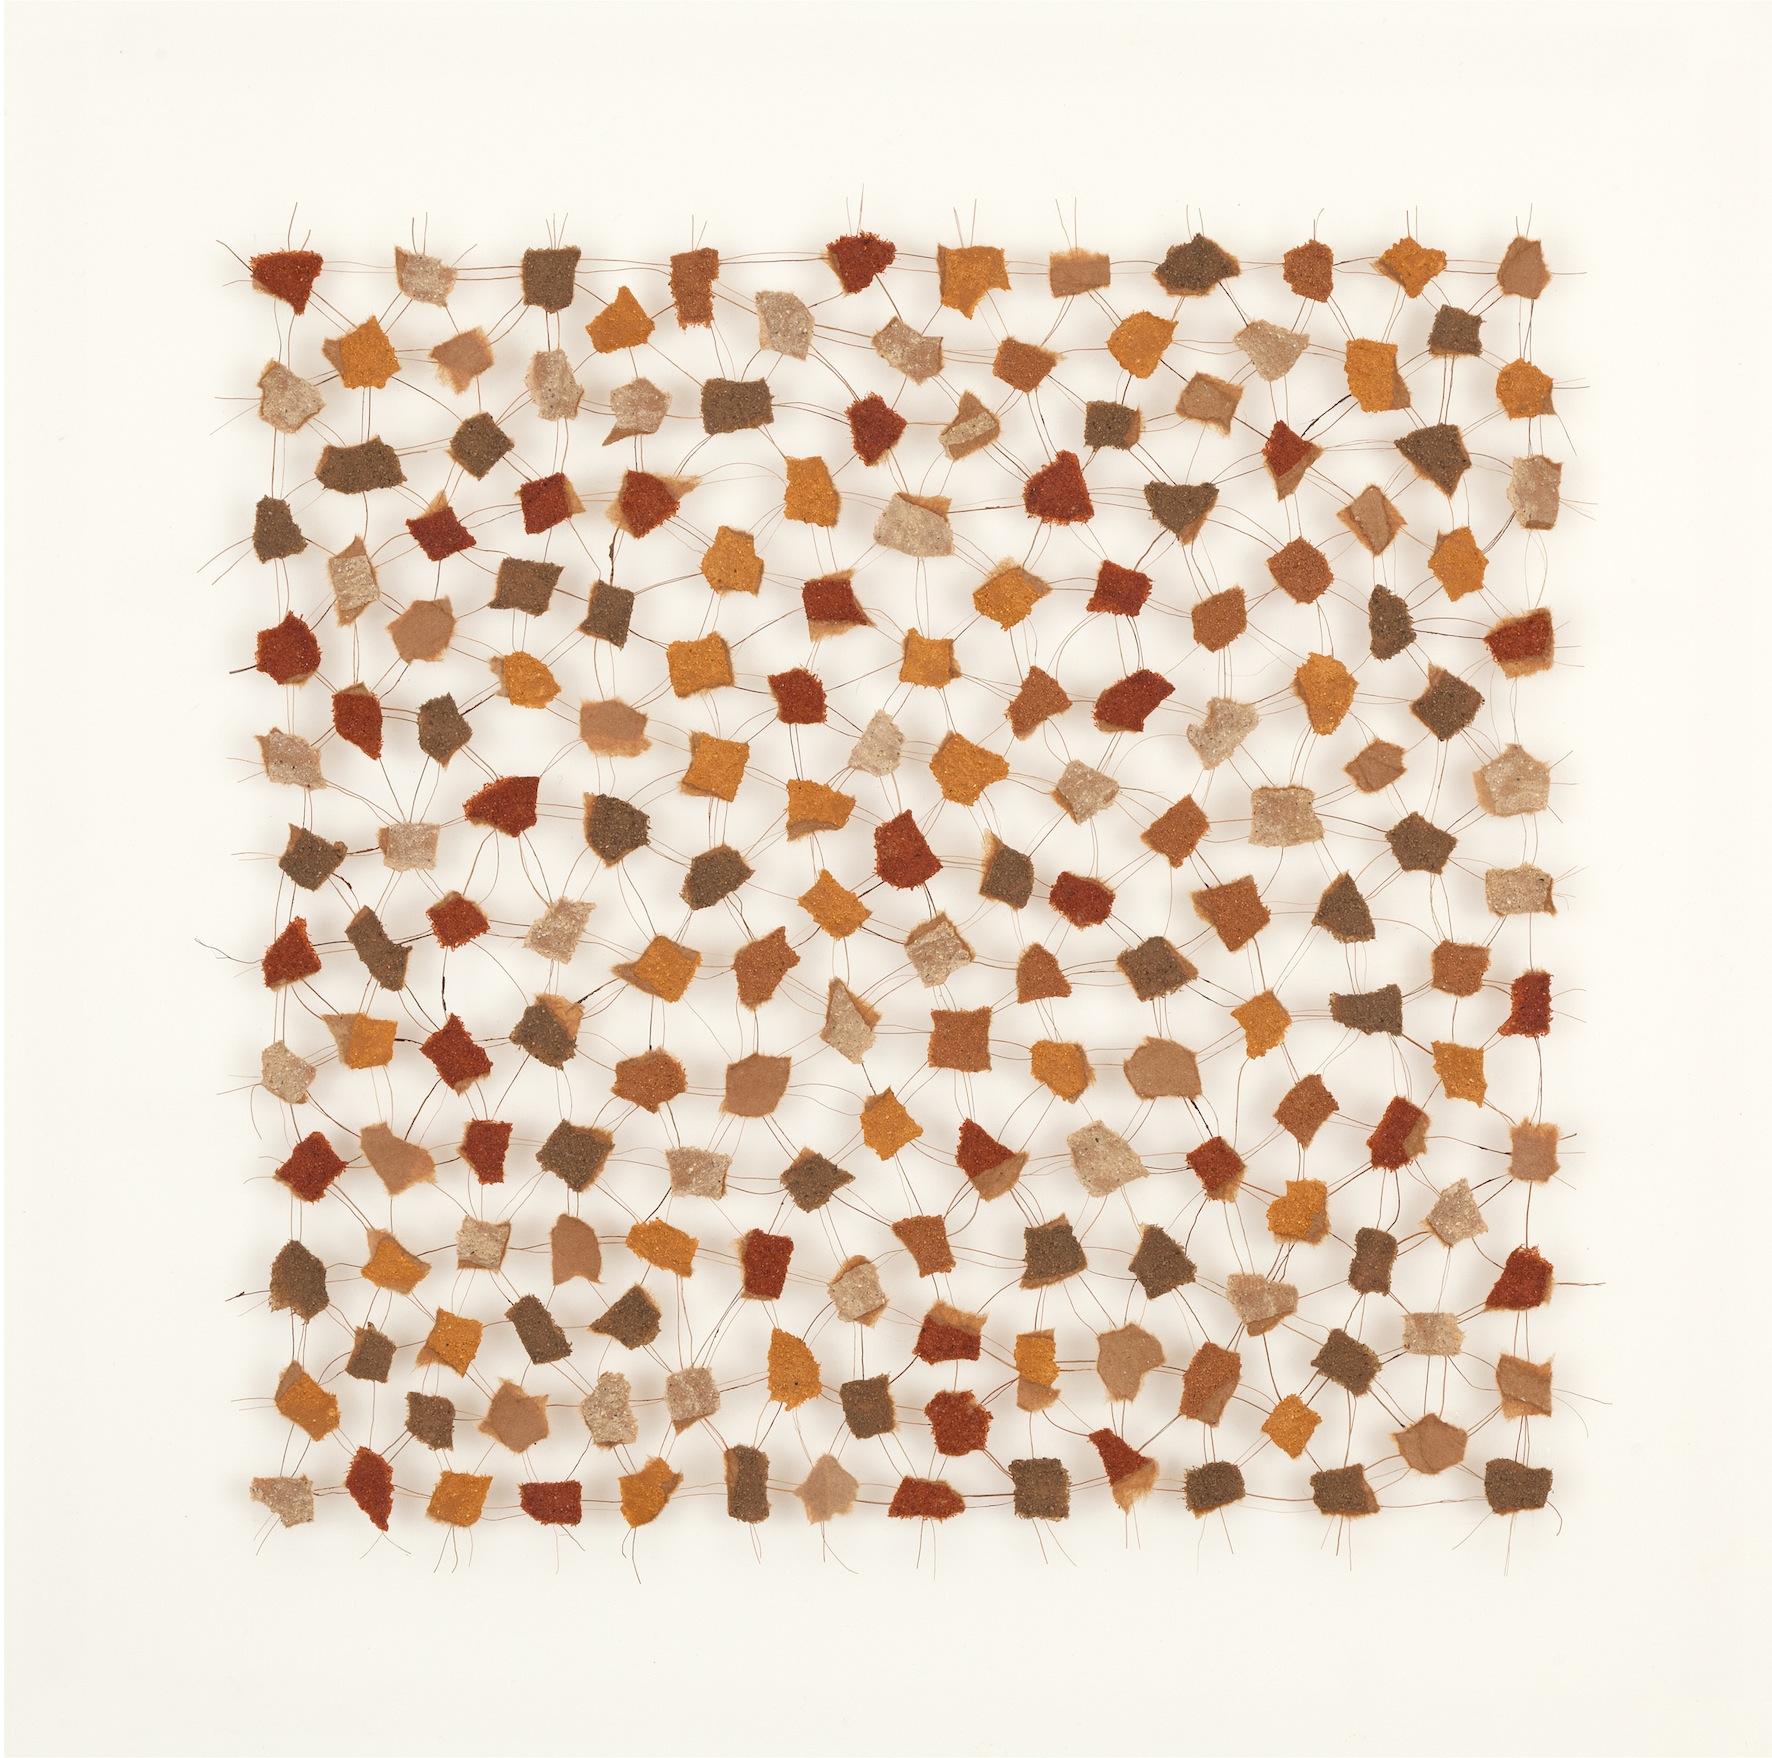 'Native Grid 0612.1' 2012